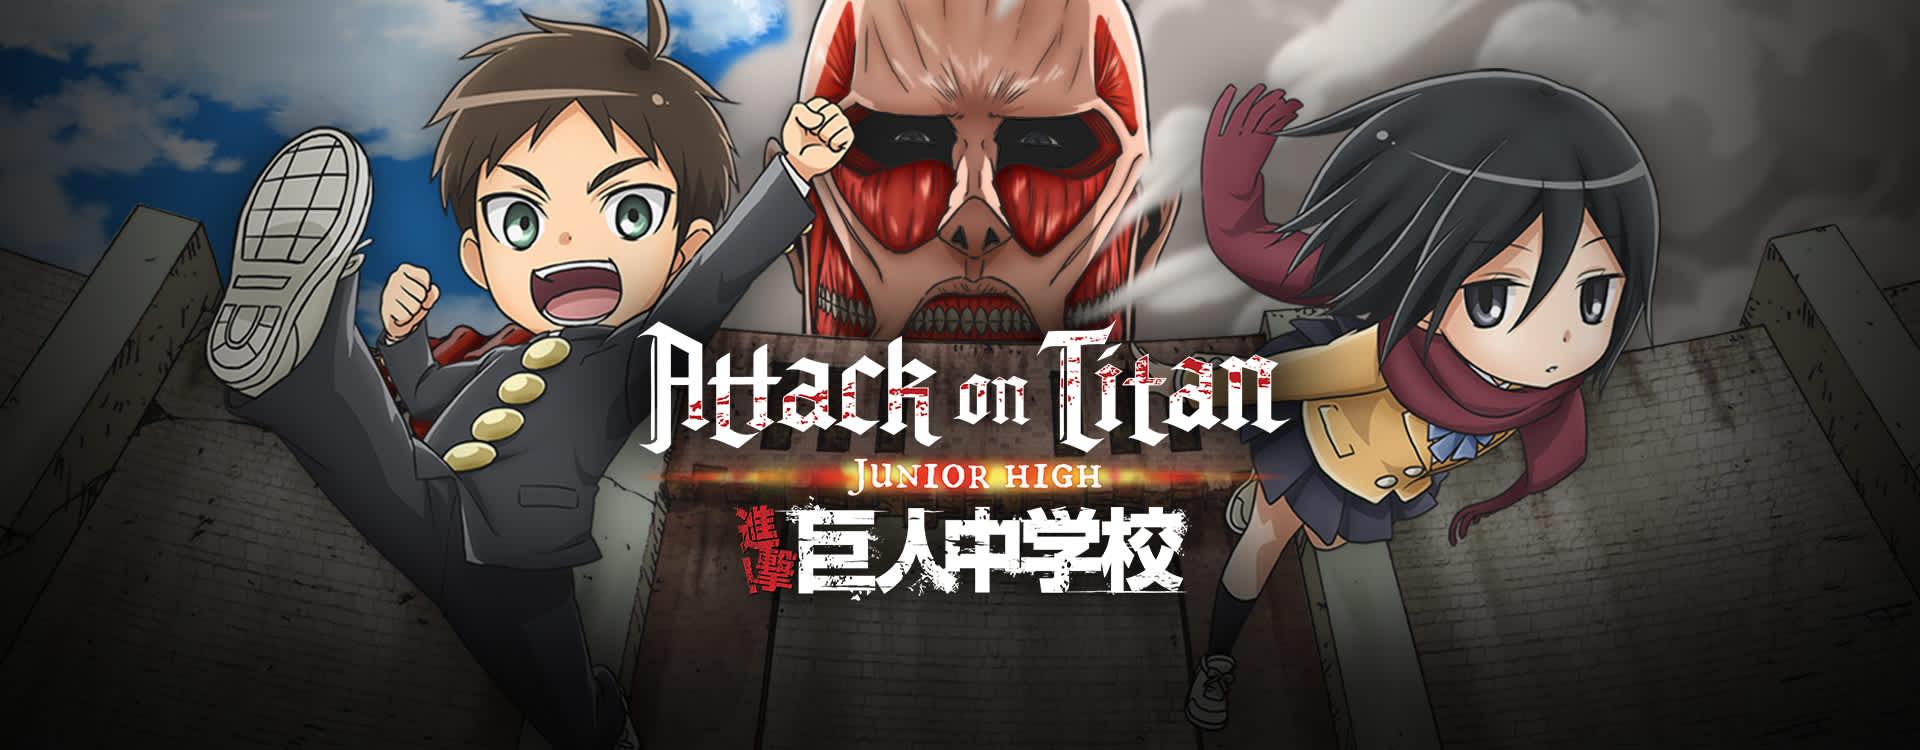 Watch Attack On Titan: Junior High Episodes Sub & Dub | Comedy Anime